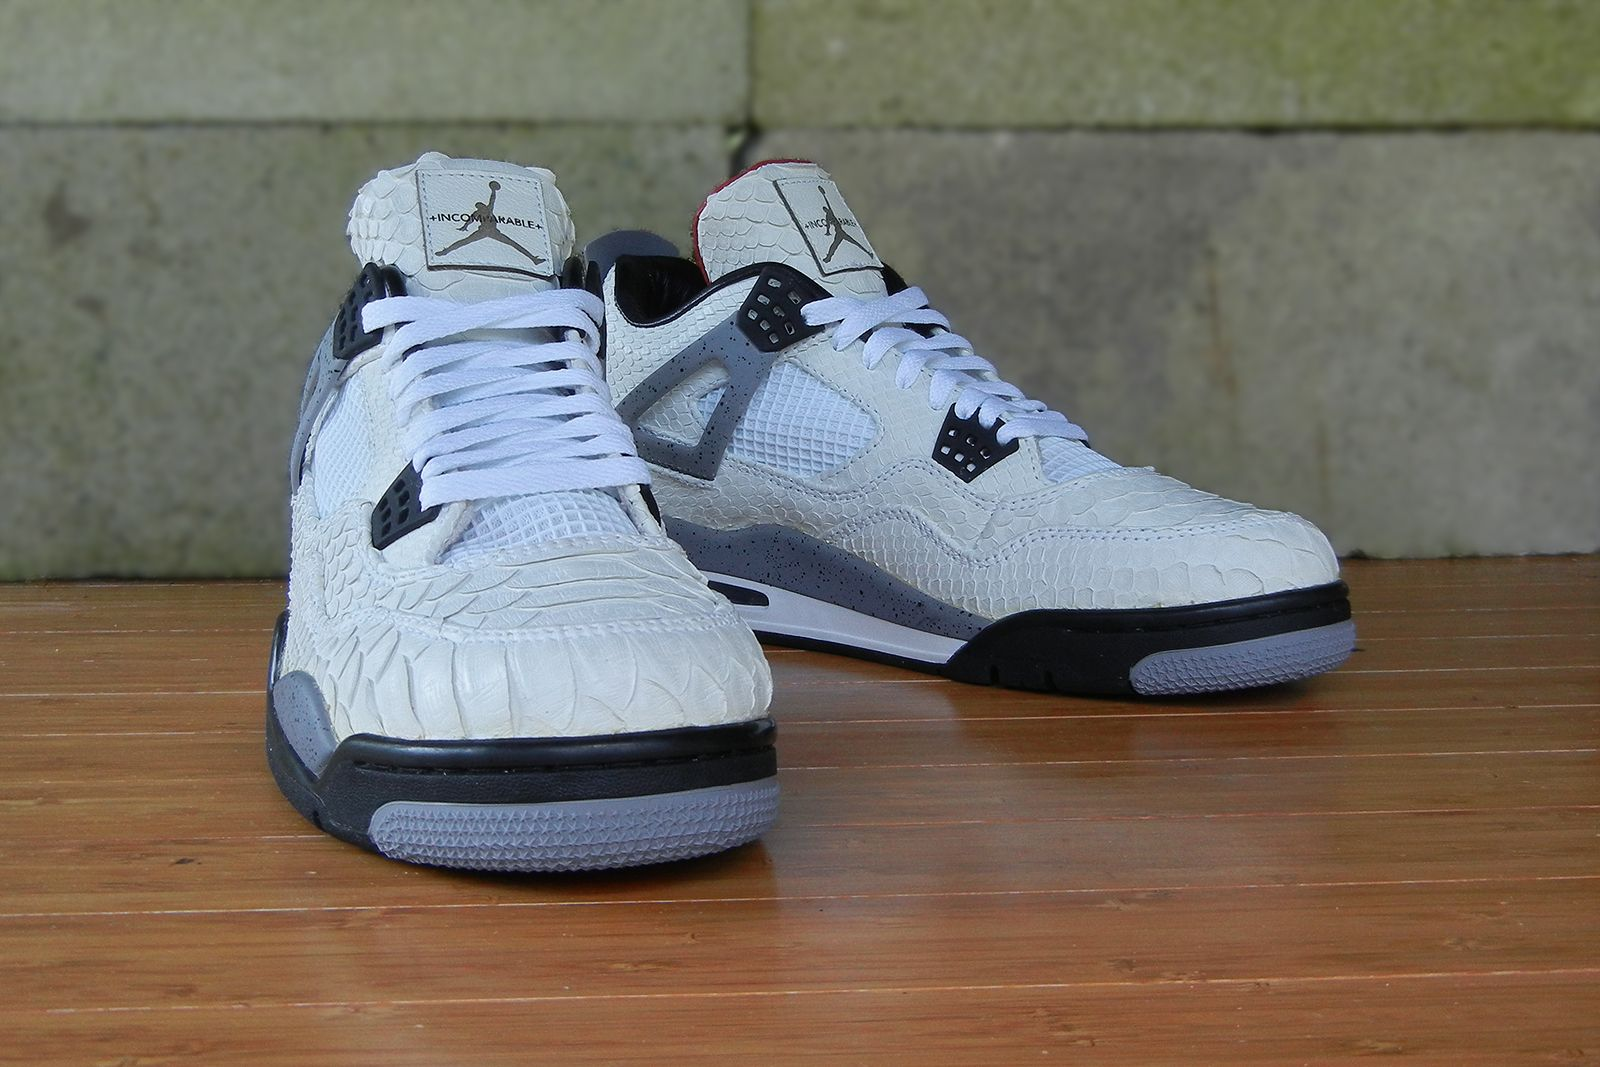 Jbf Customs Air Jordan 4 White Python Cement